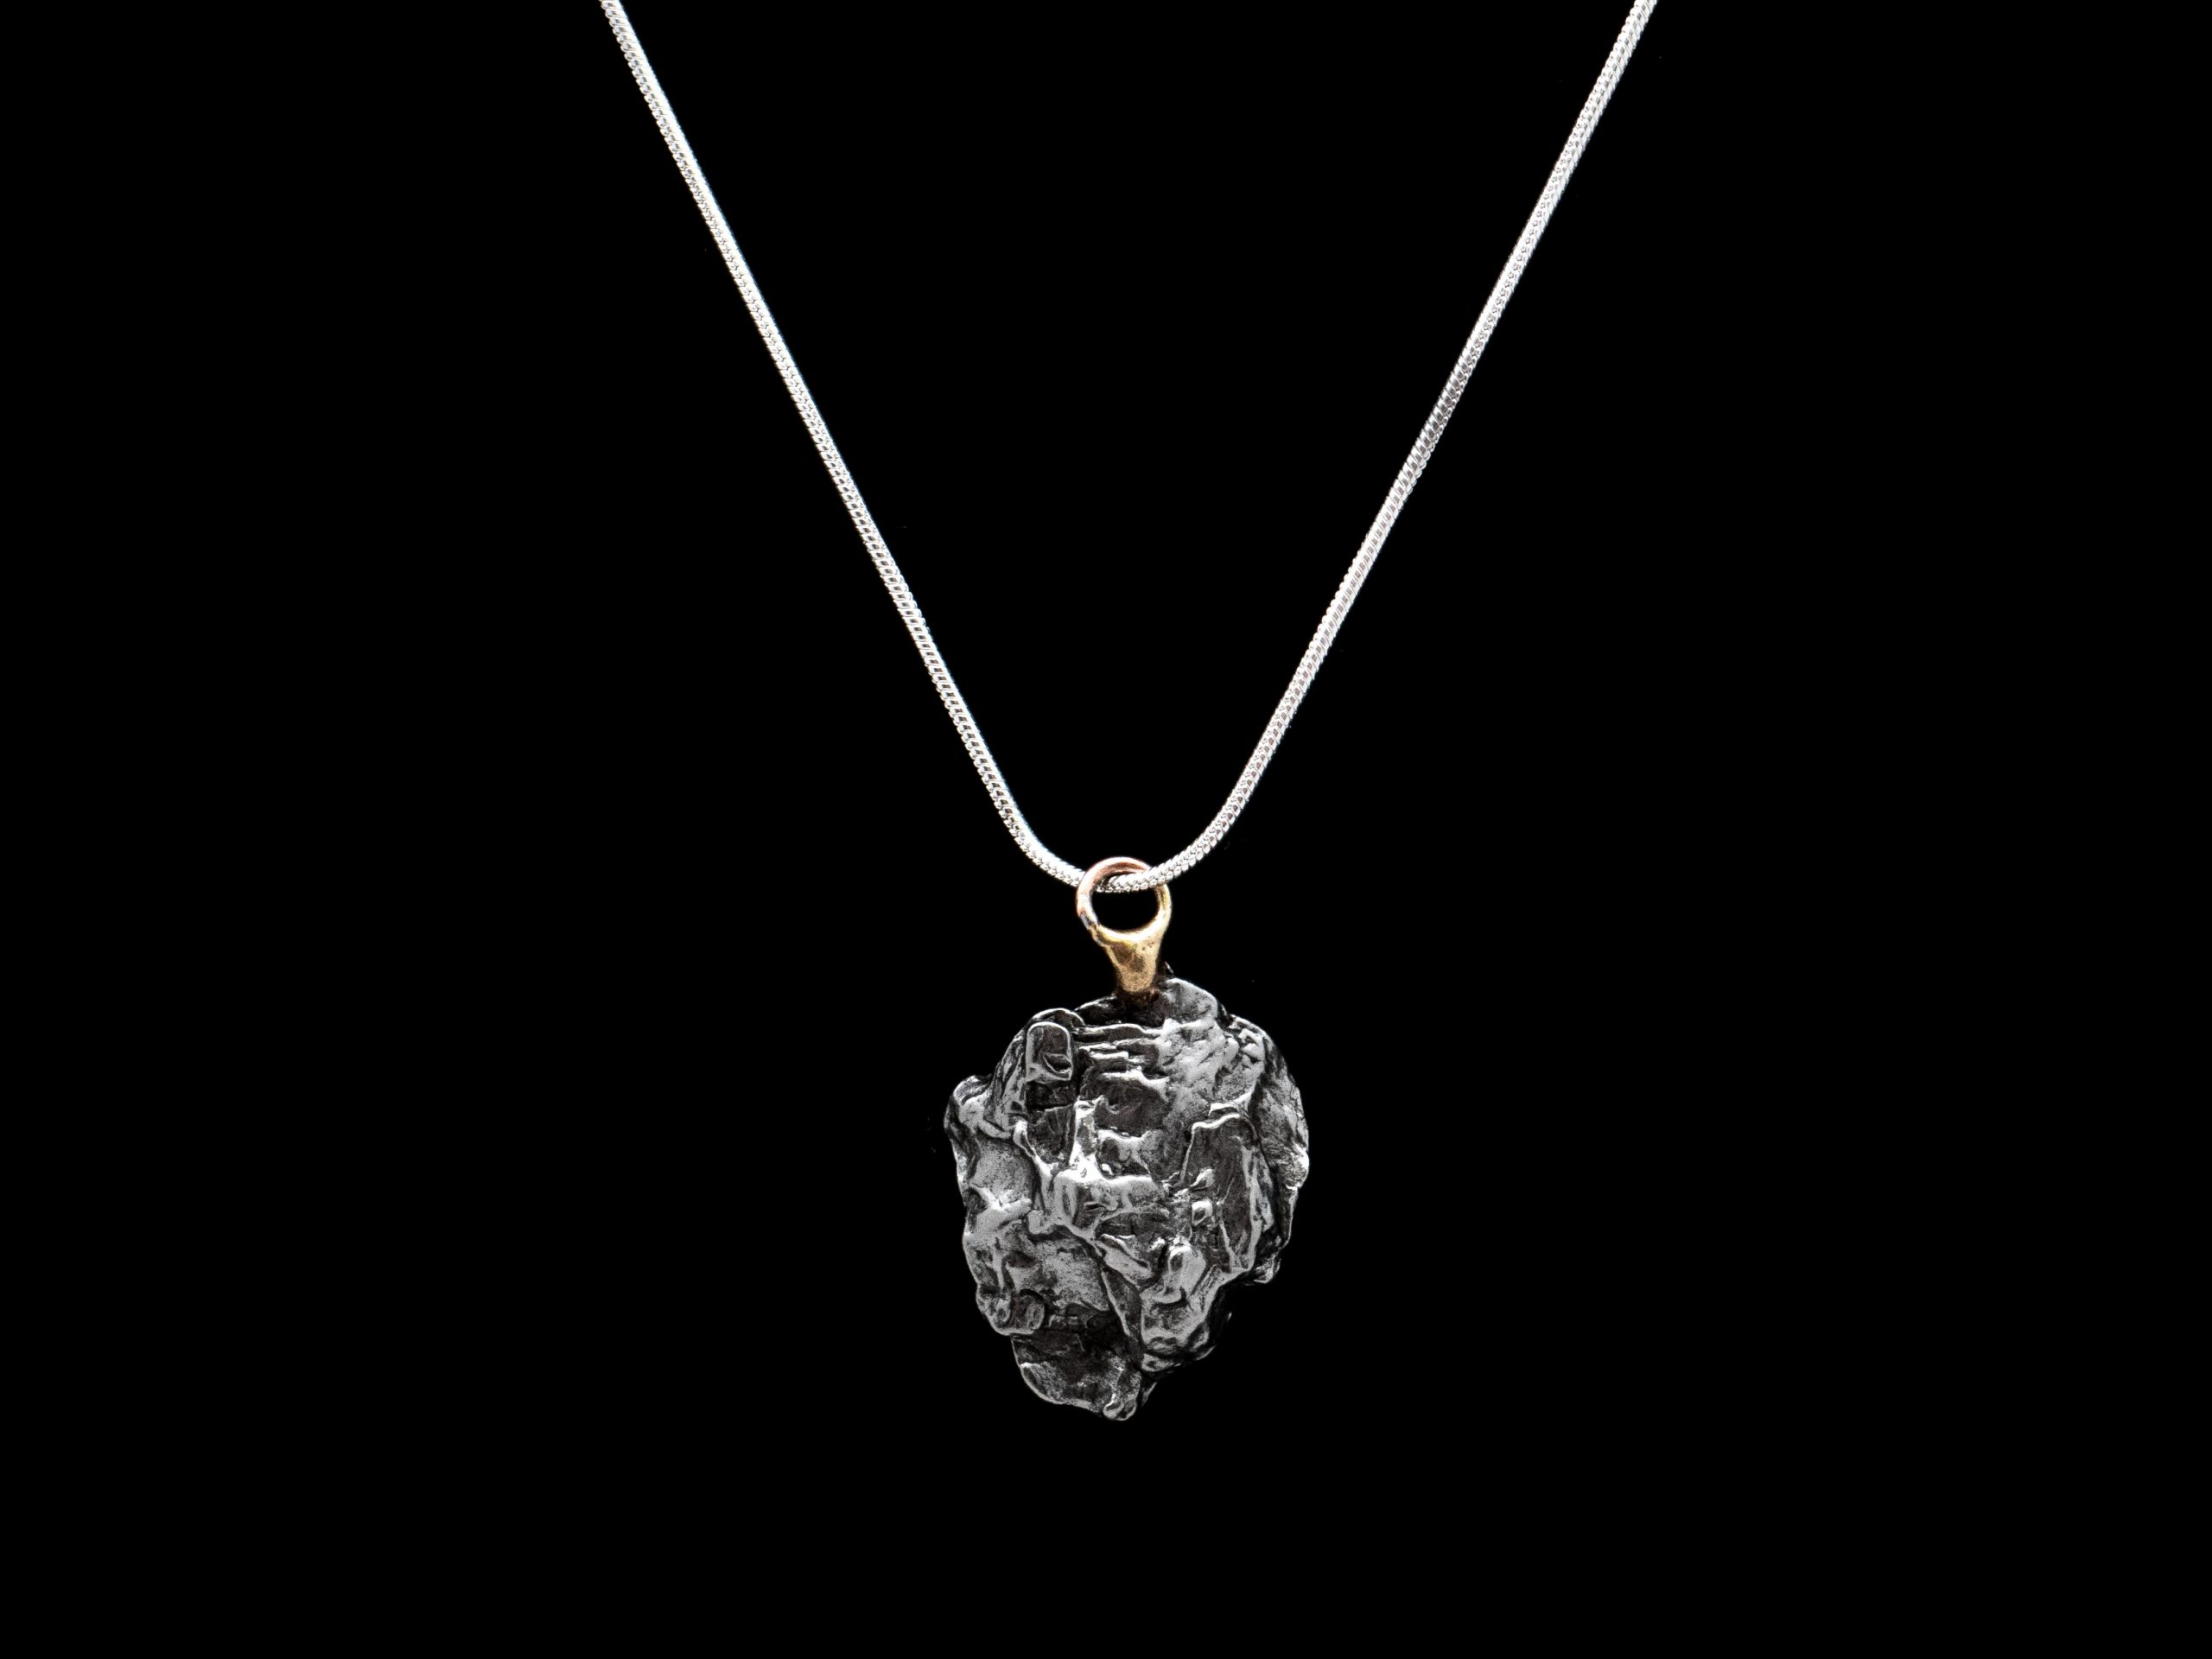 campo necklace 1